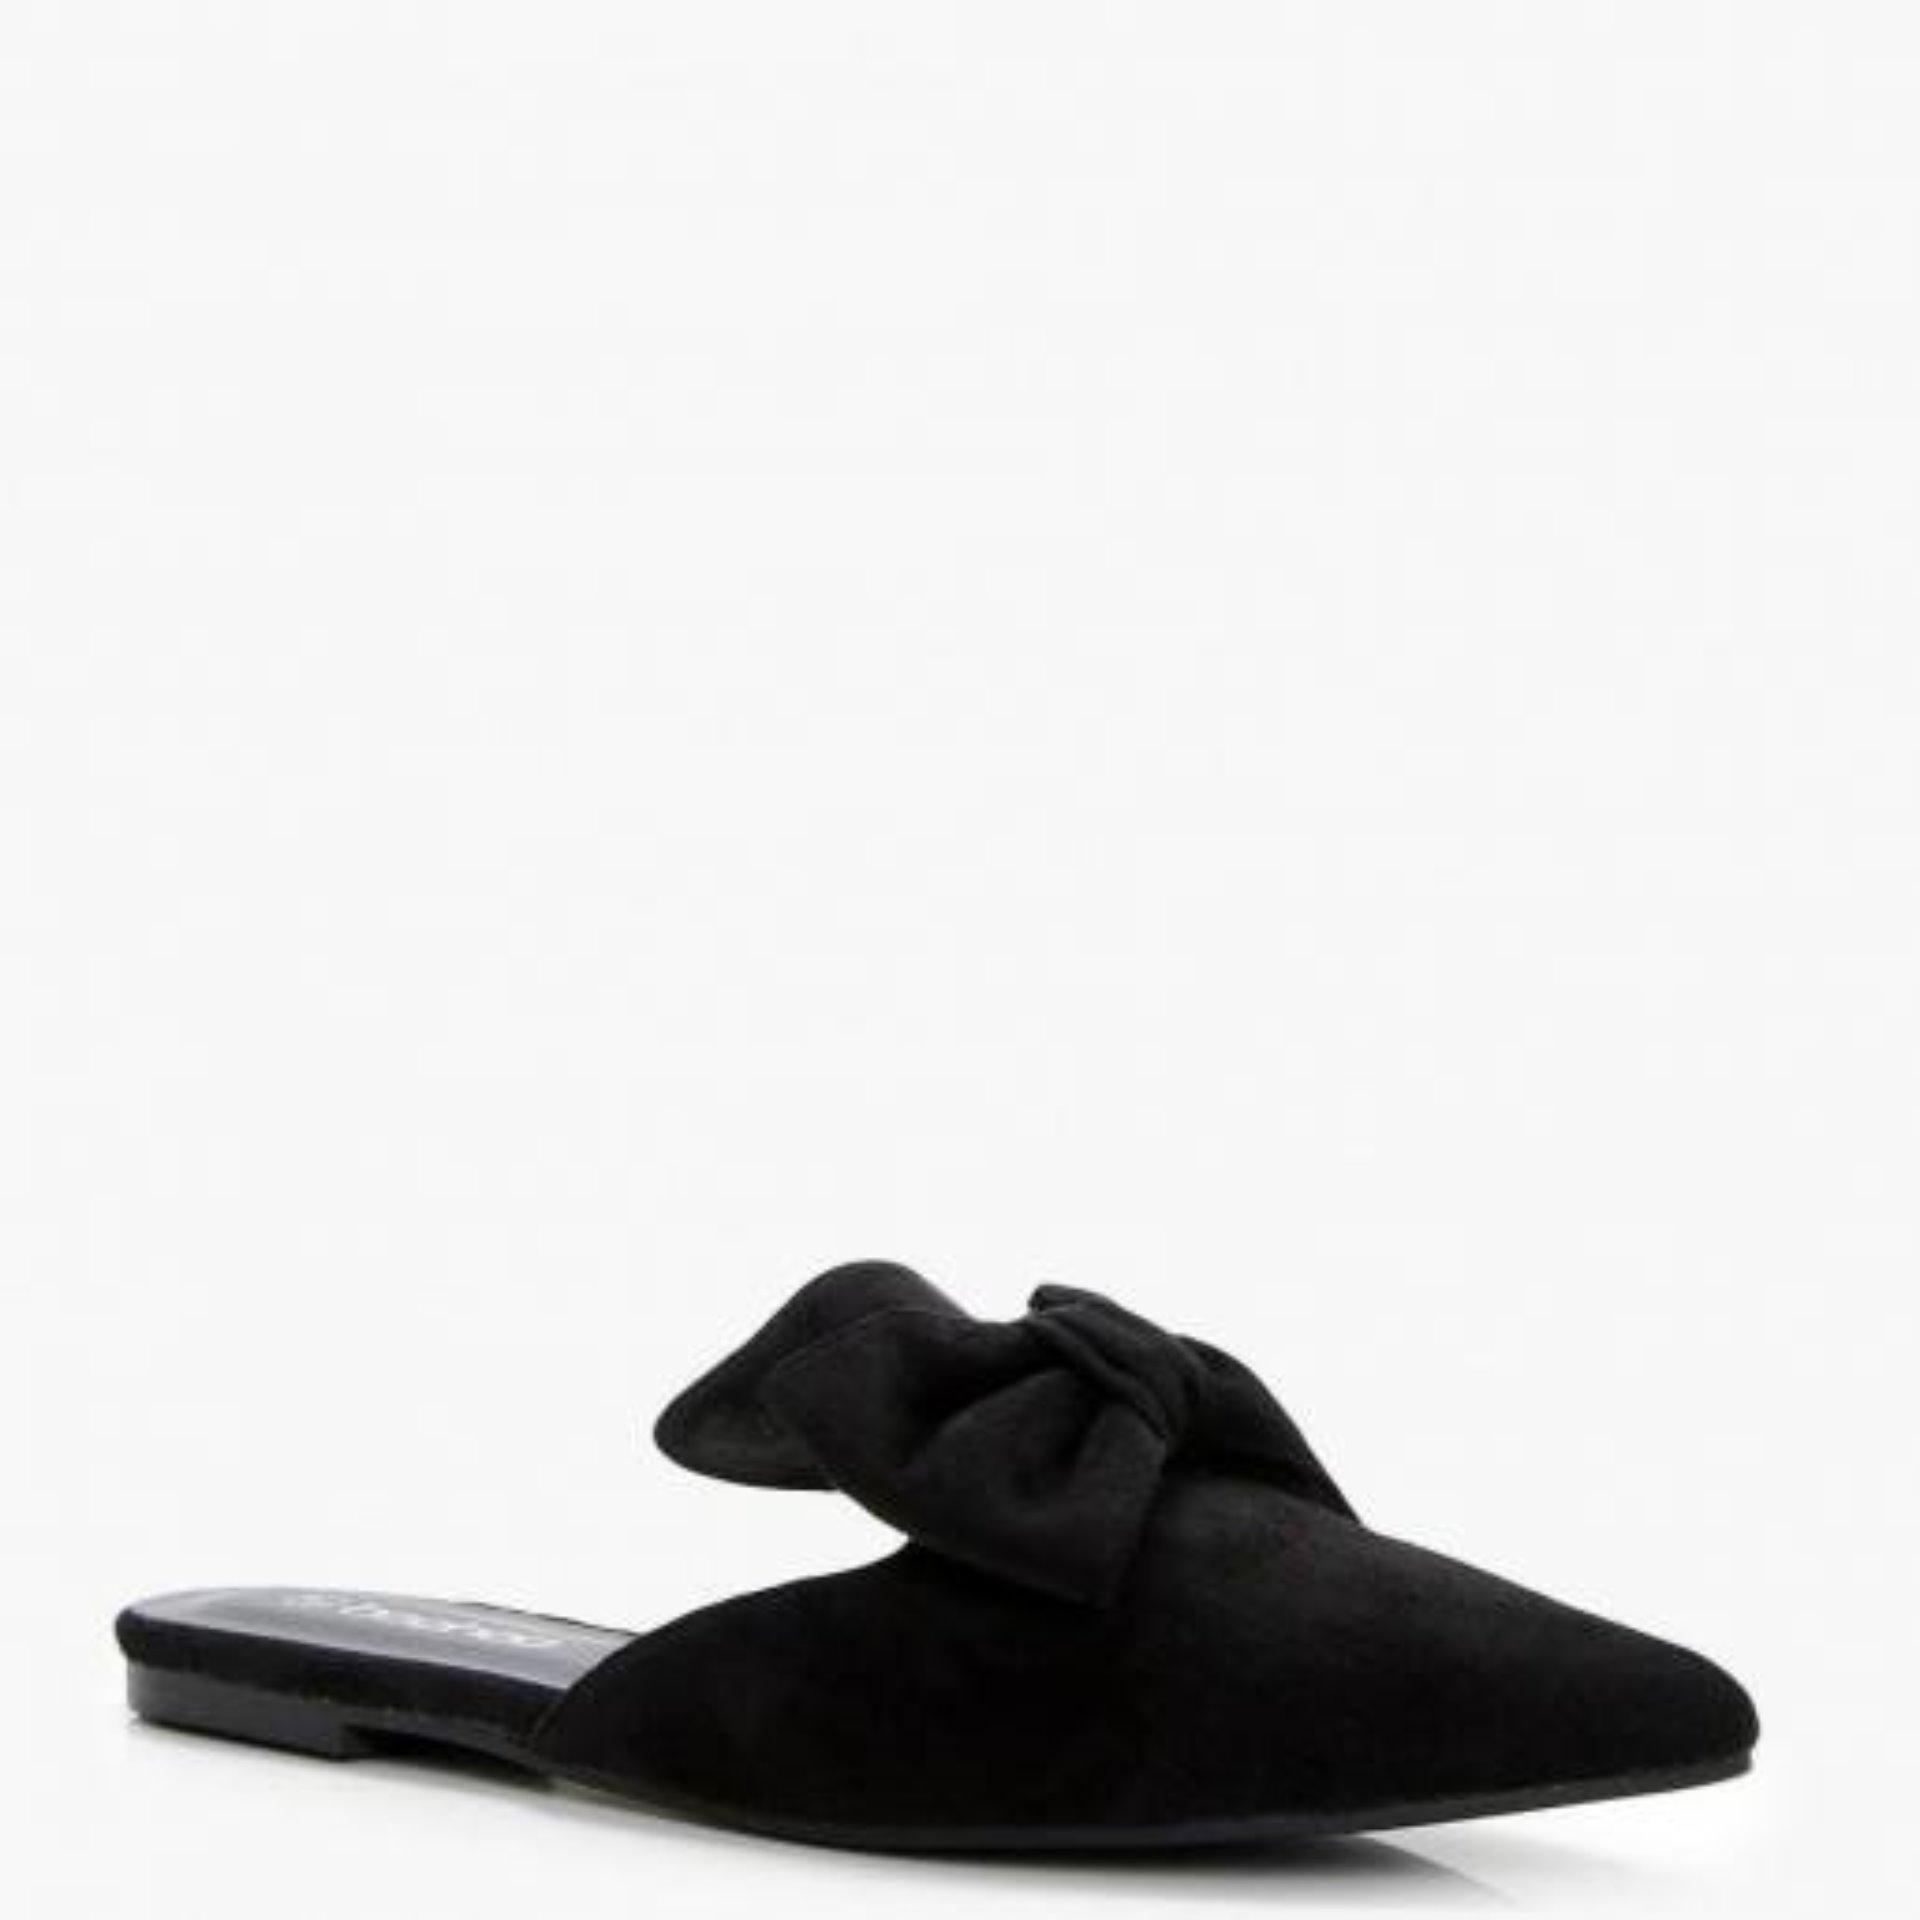 Buy Sell Cheapest Sandal Sepatu Mules Best Quality Product Deals Yongki Komaladi Loafers Casandra Black Hitam 36 Dshoppers Shoes Slide Kiara